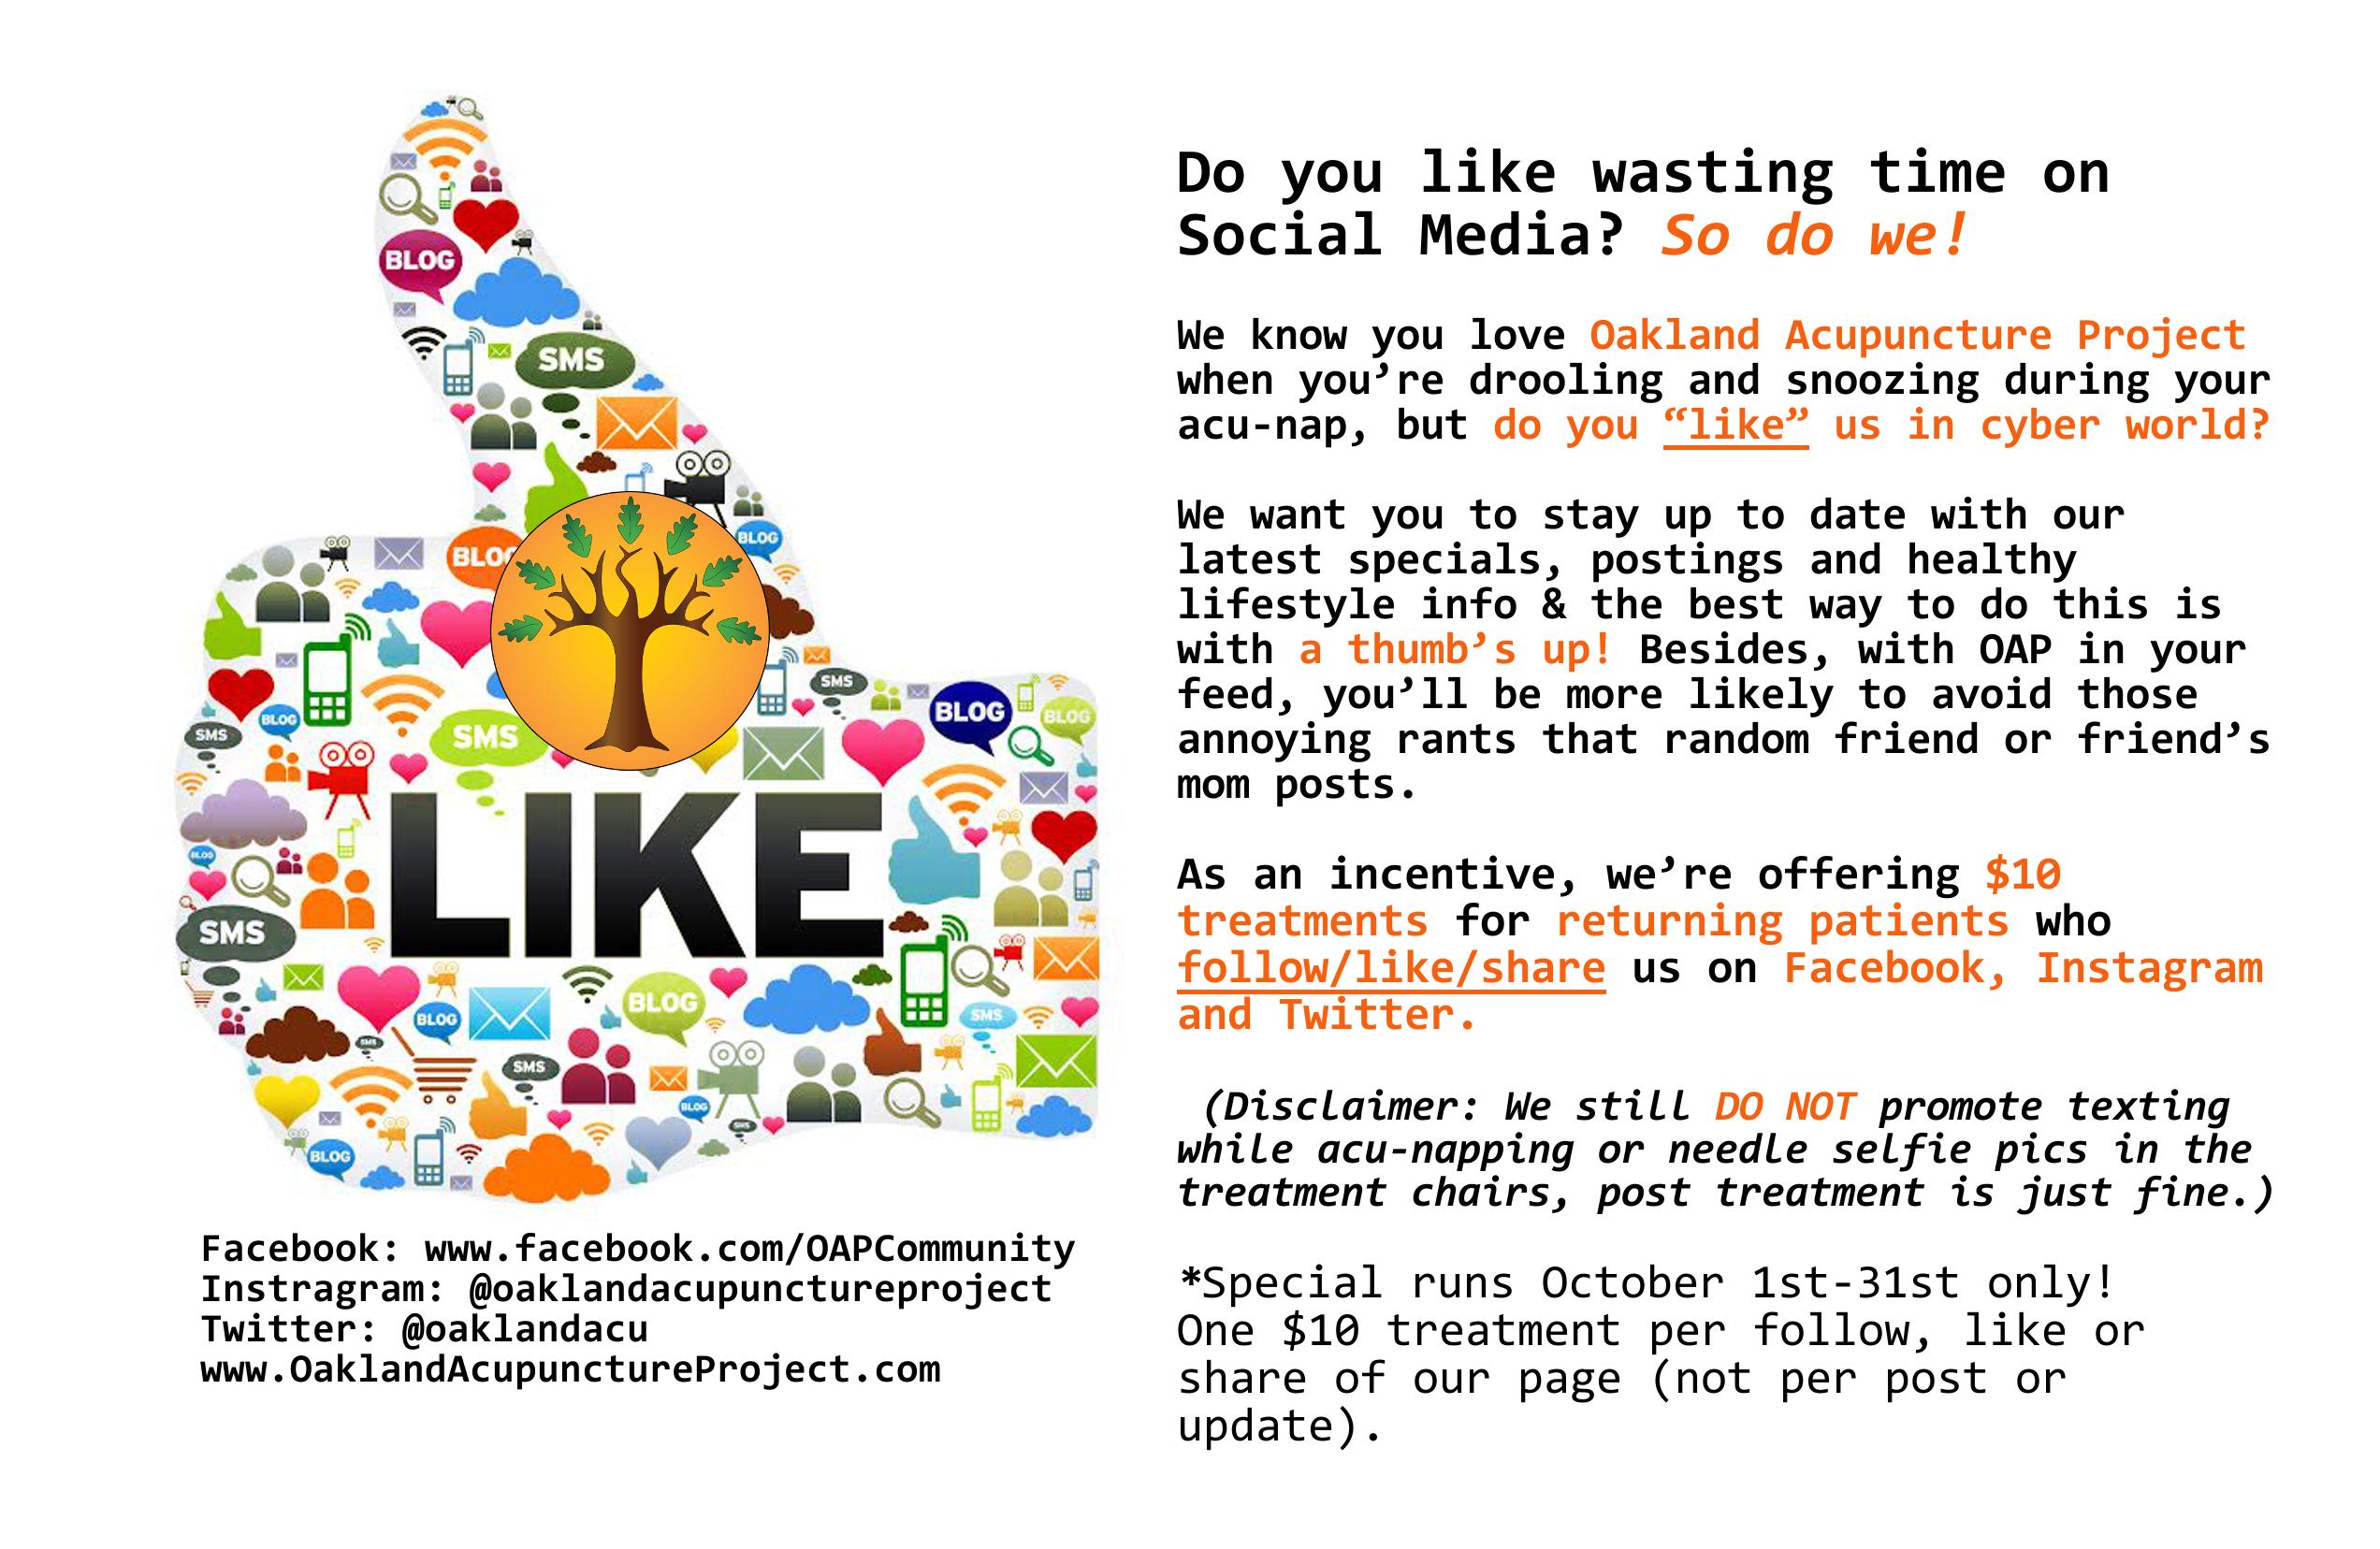 socialmedia_special_thumbsup